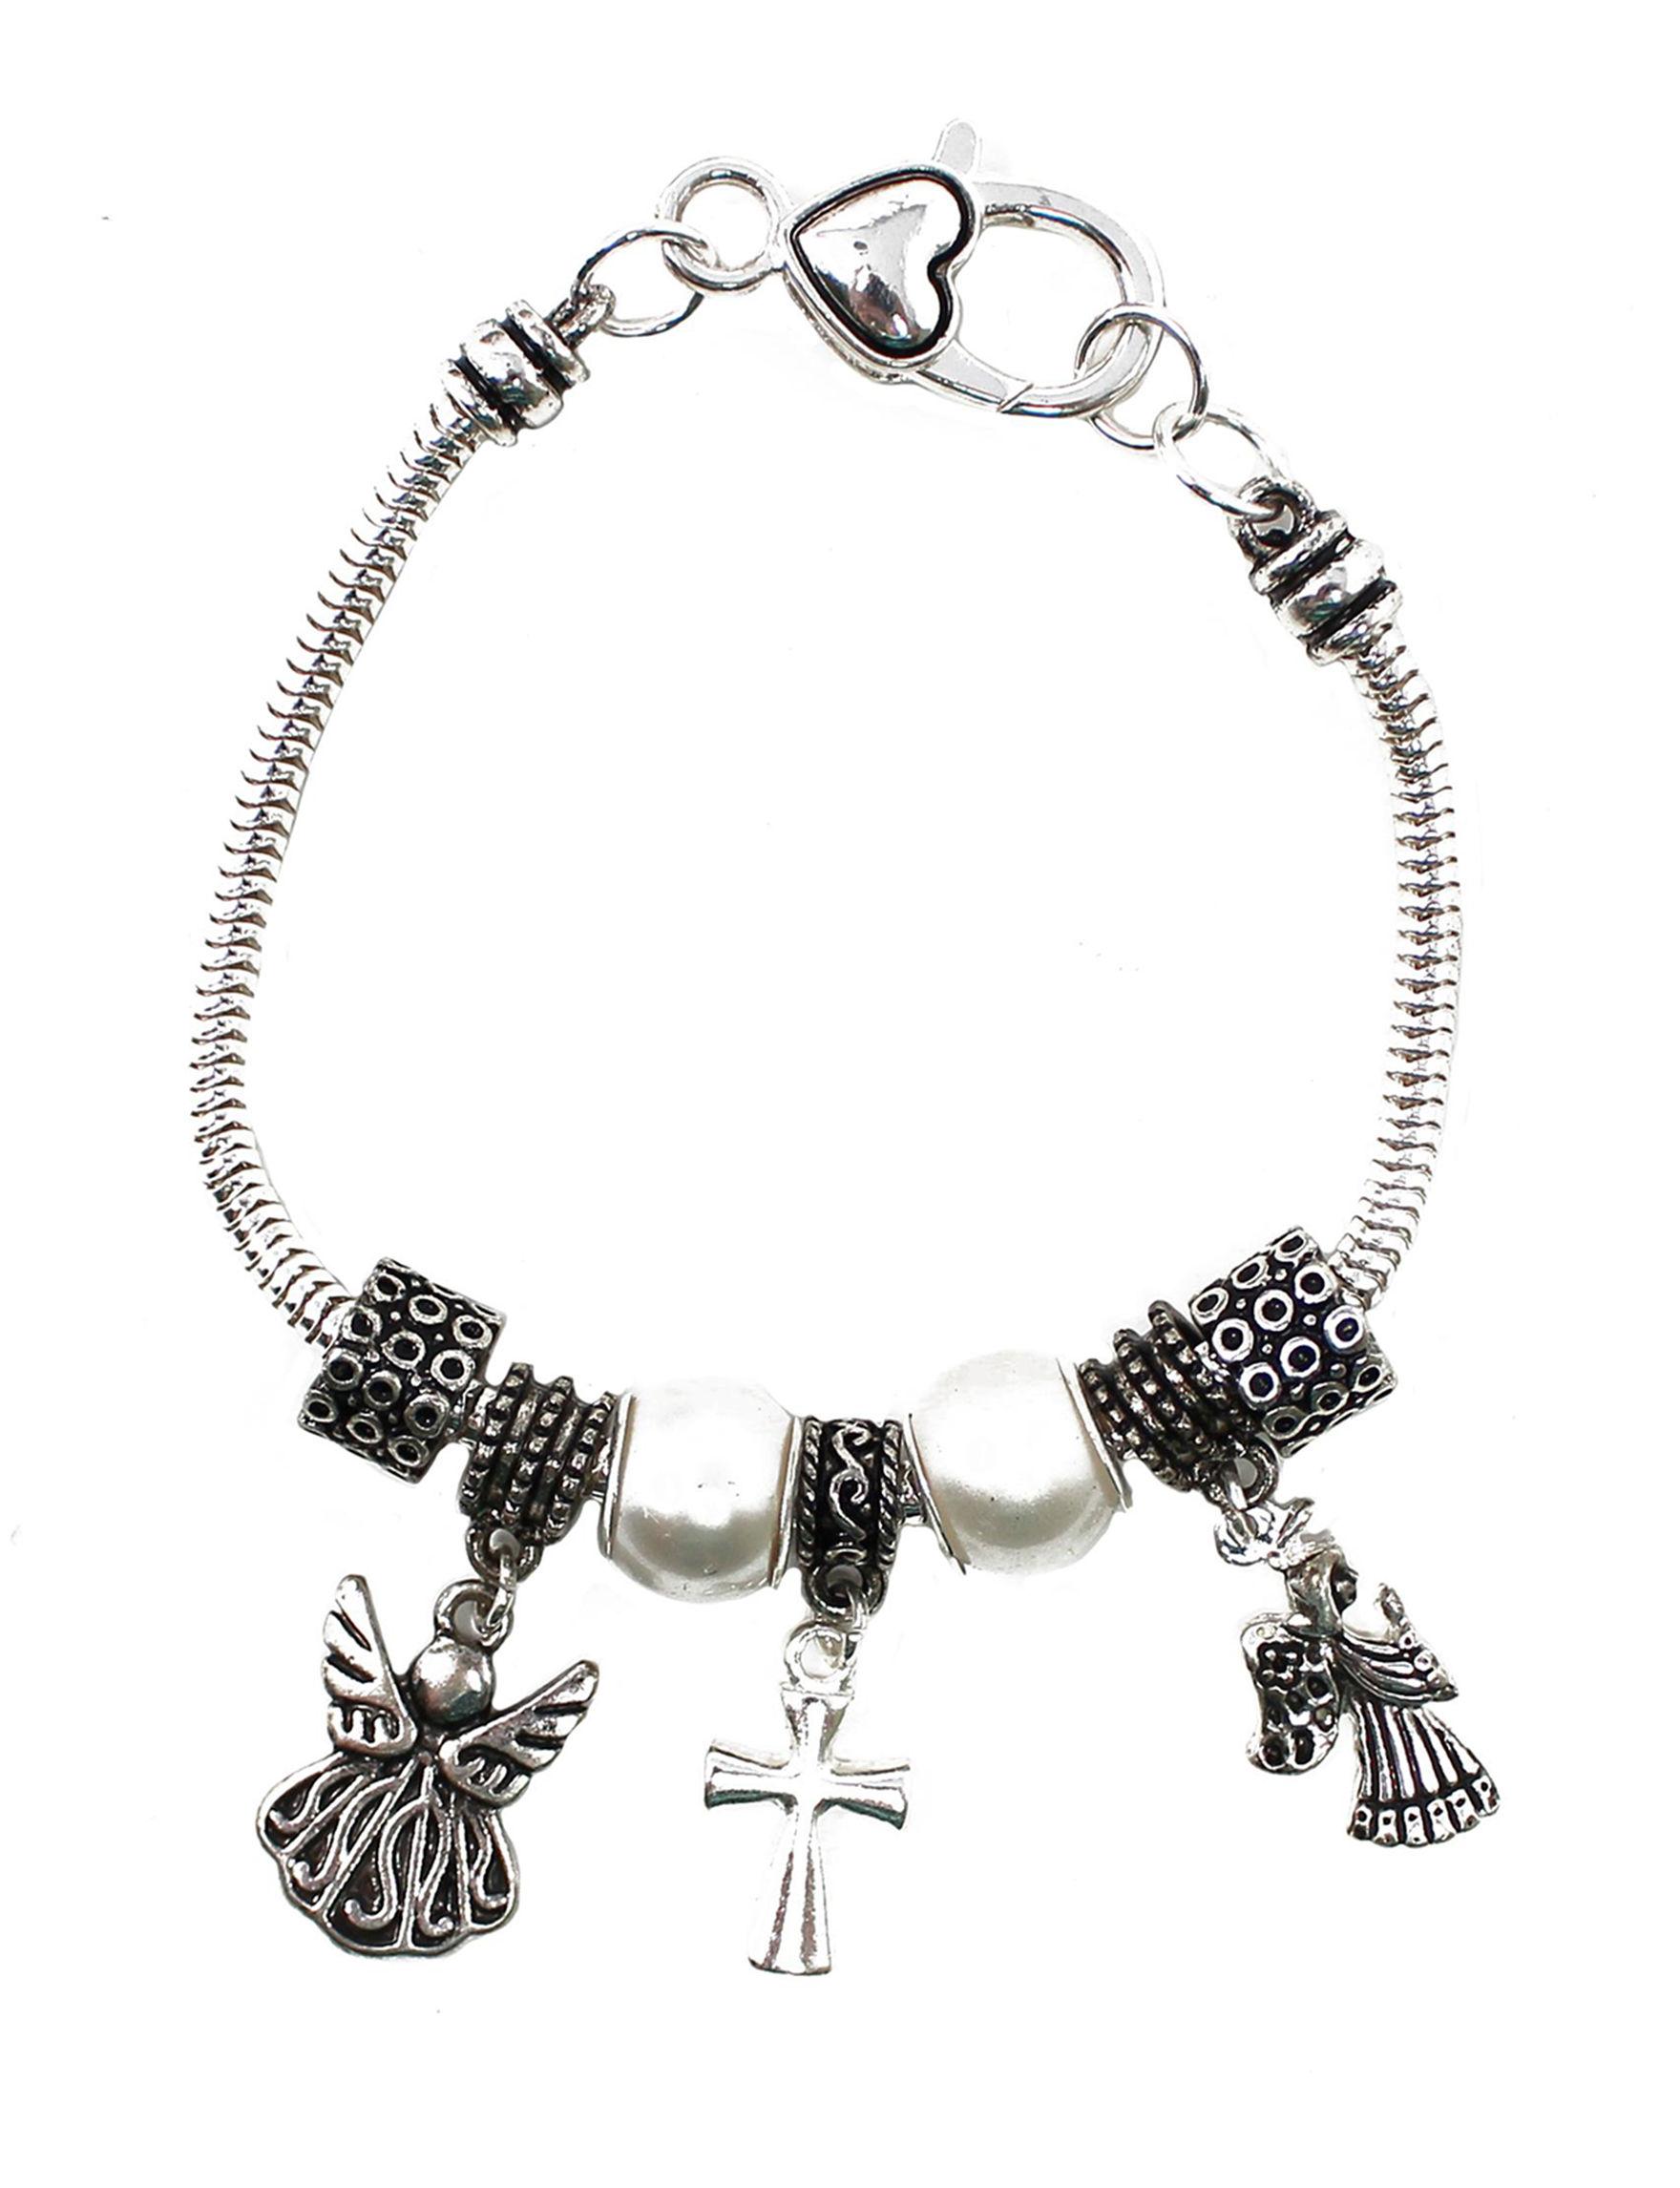 L & J Silver / Black Fashion Jewelry